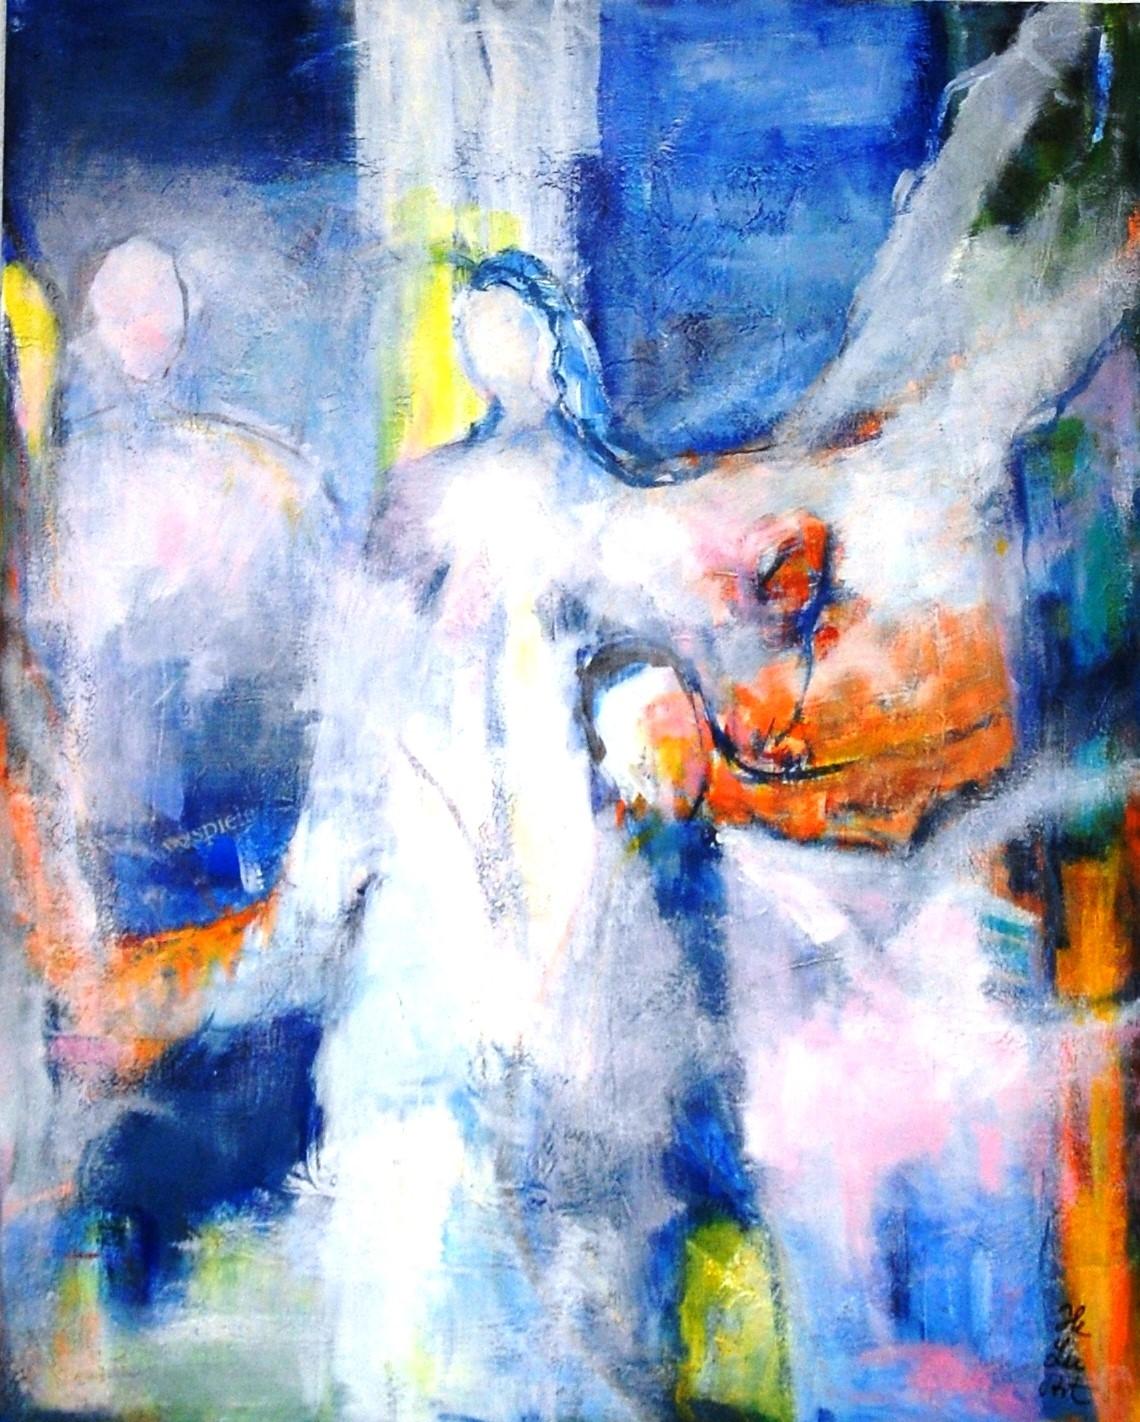 Der engel kommt - 1 part 3